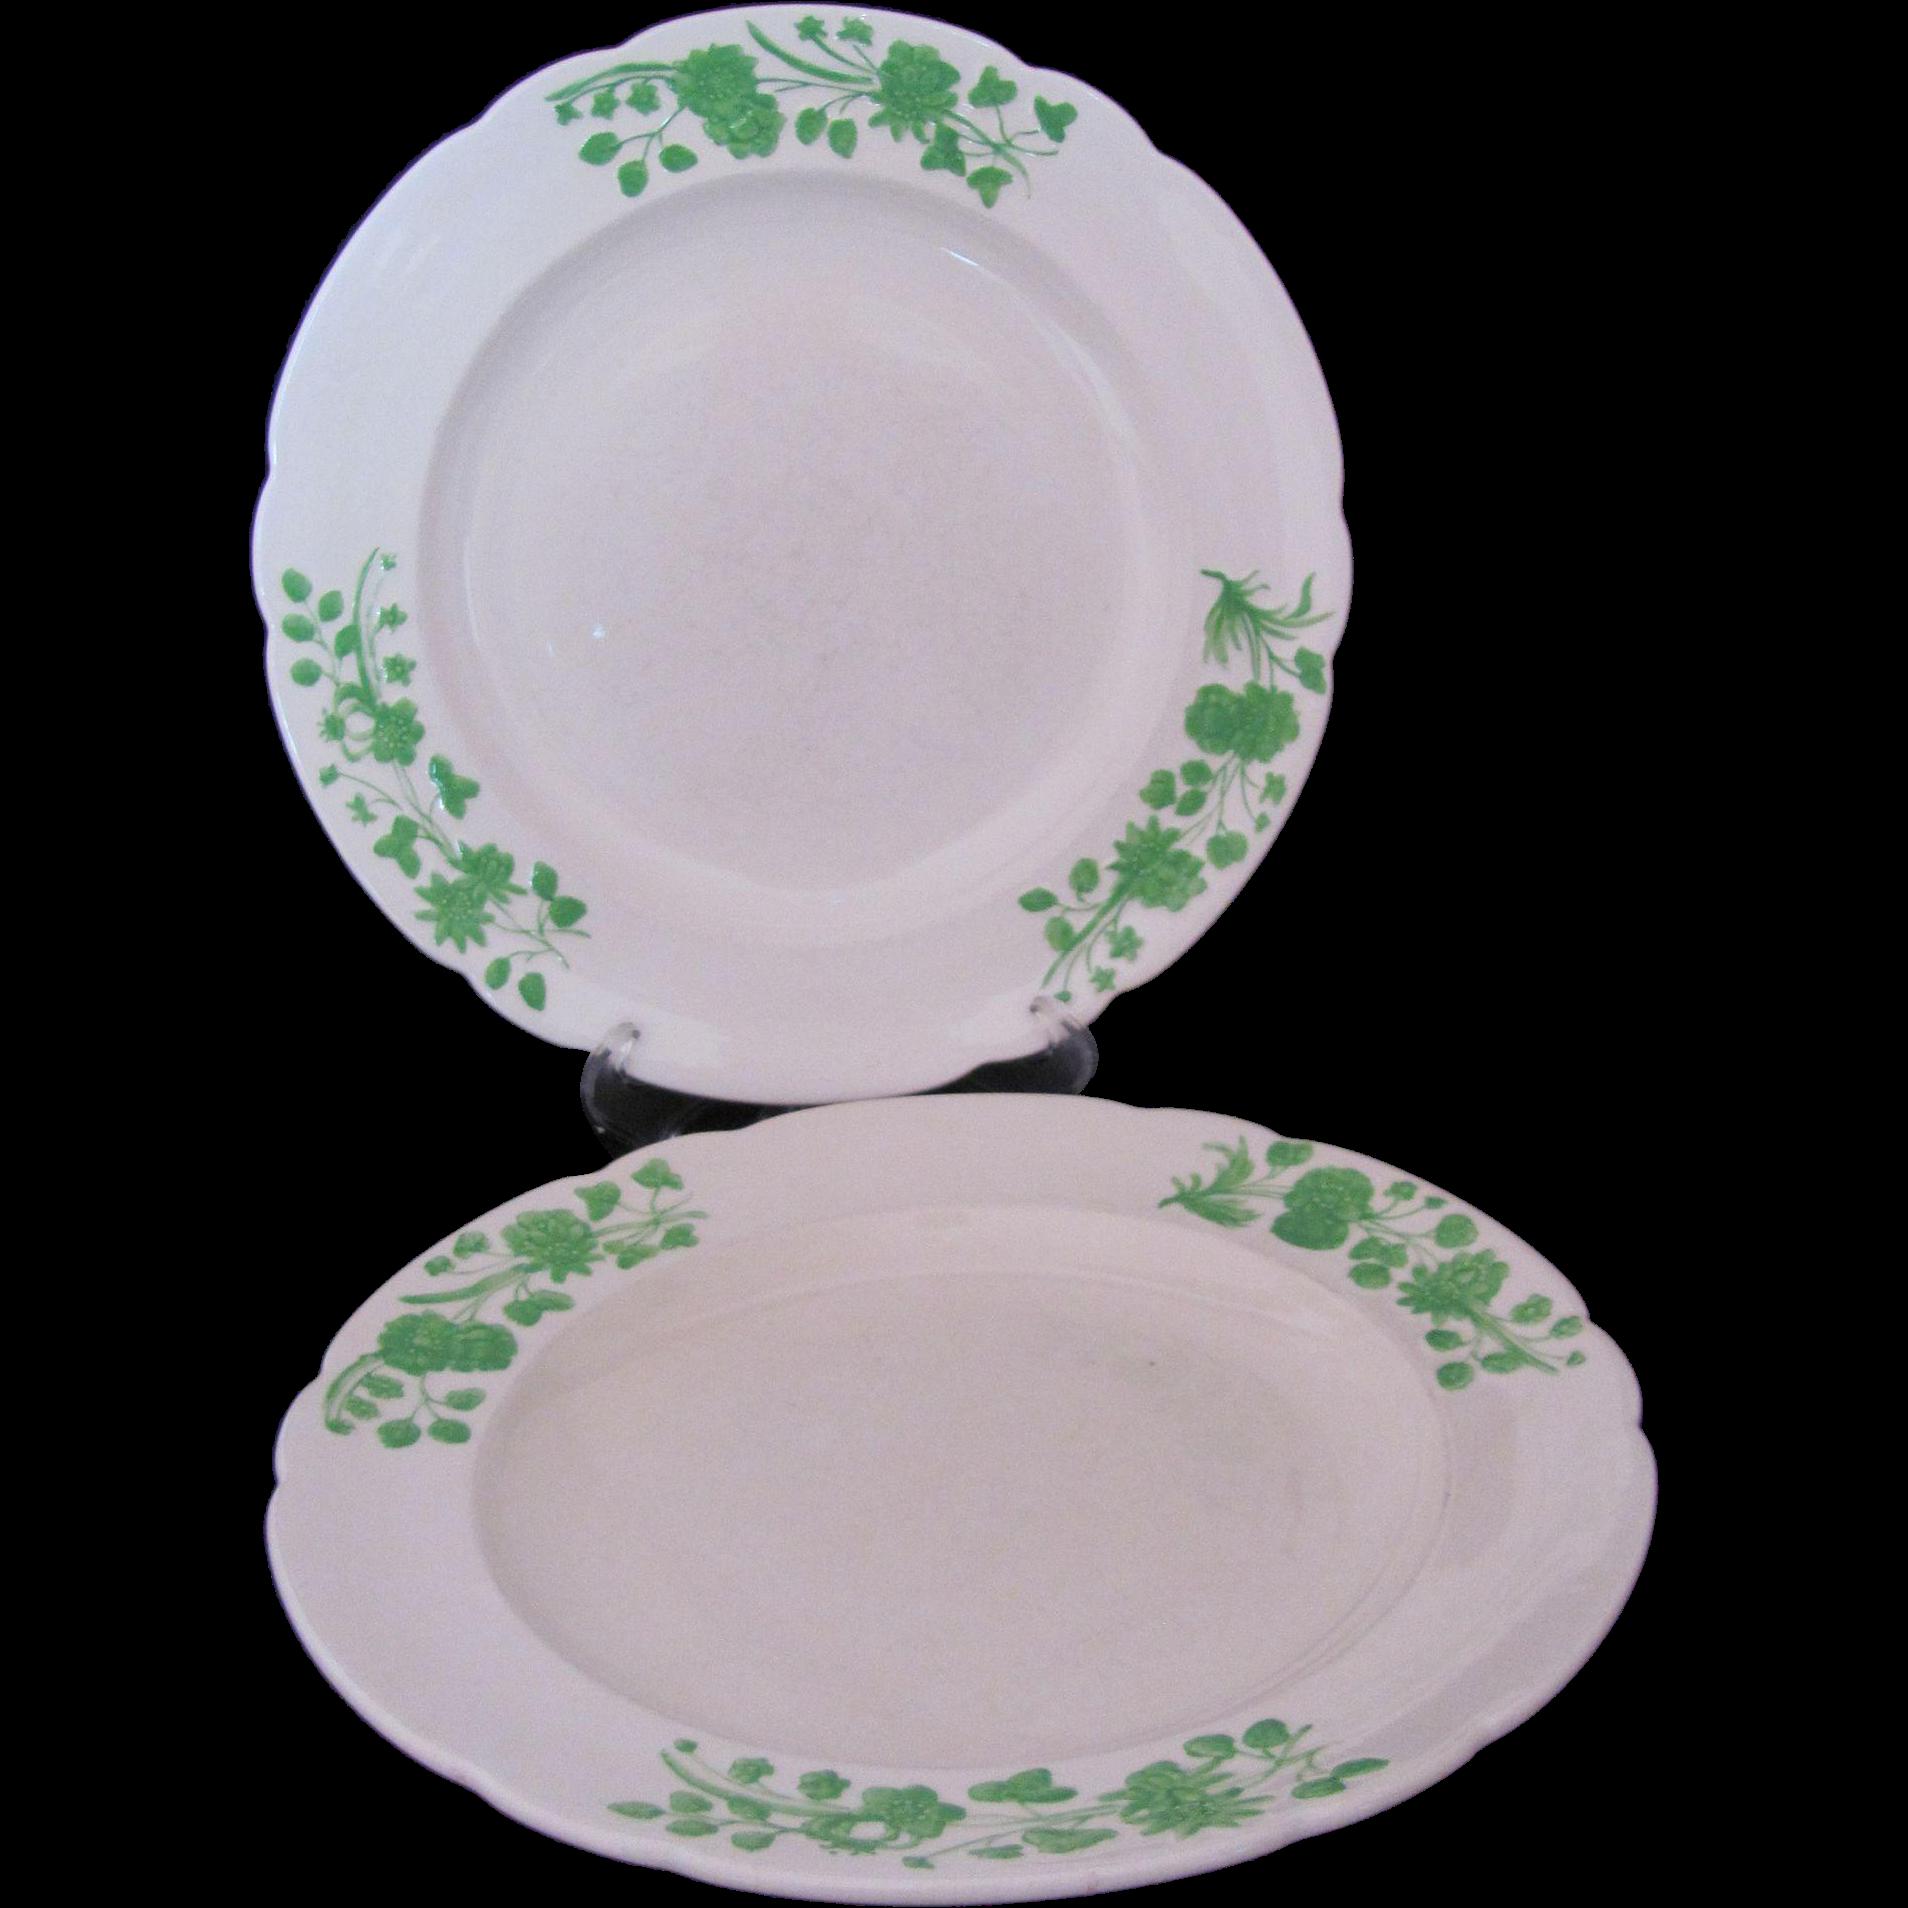 Copeland Spode Salad Dessert Luncheon Plate Shamrock 1930's Set of Two